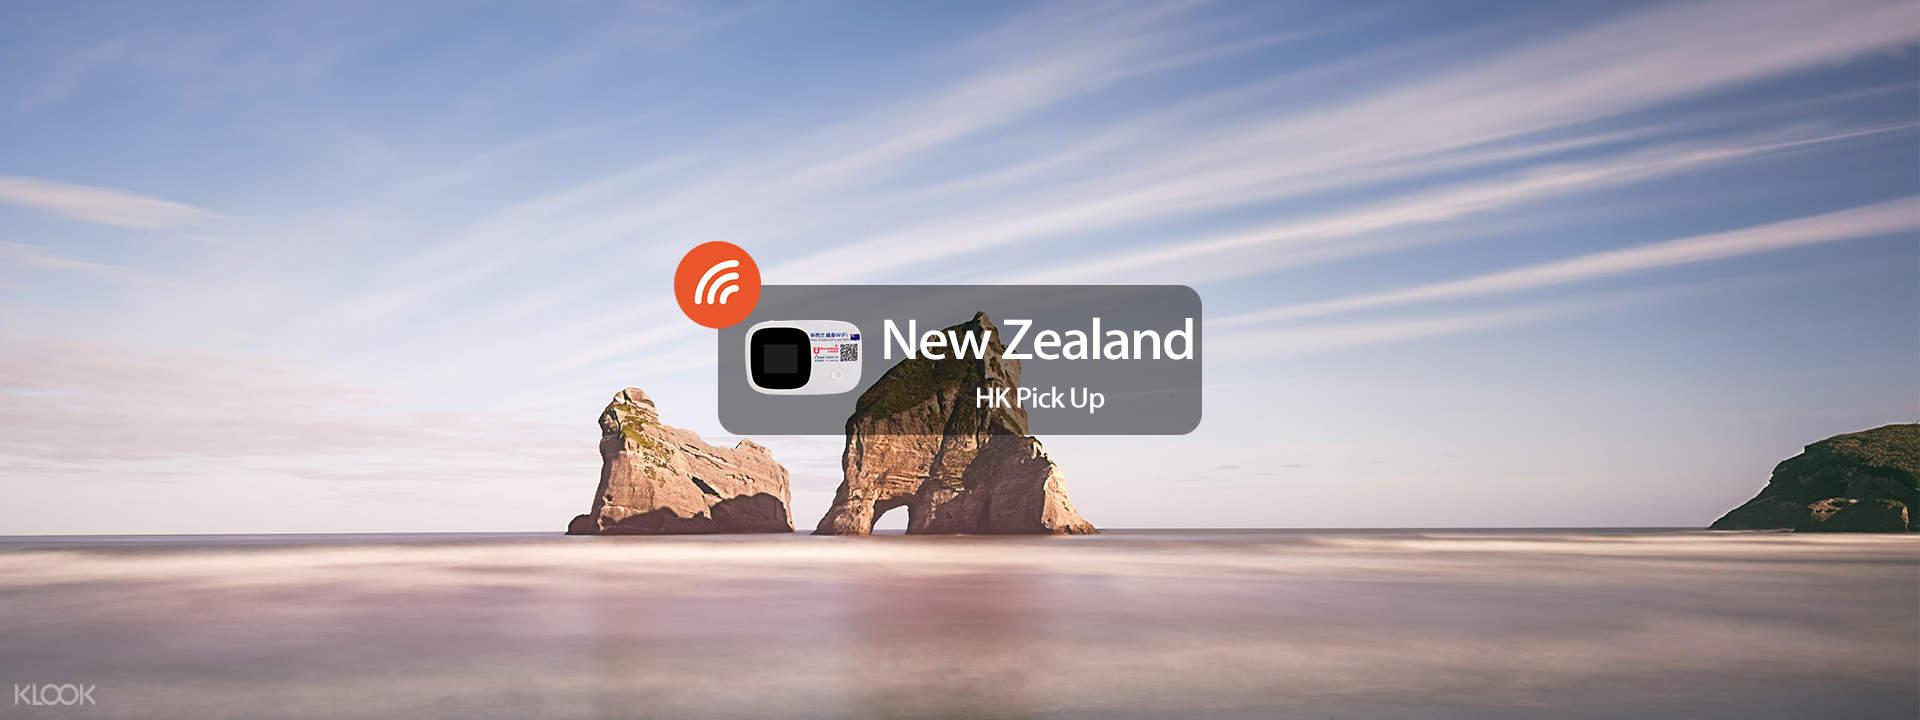 4G/3G WiFi (Hong Kong Pick Up) for Australia/New Zealand